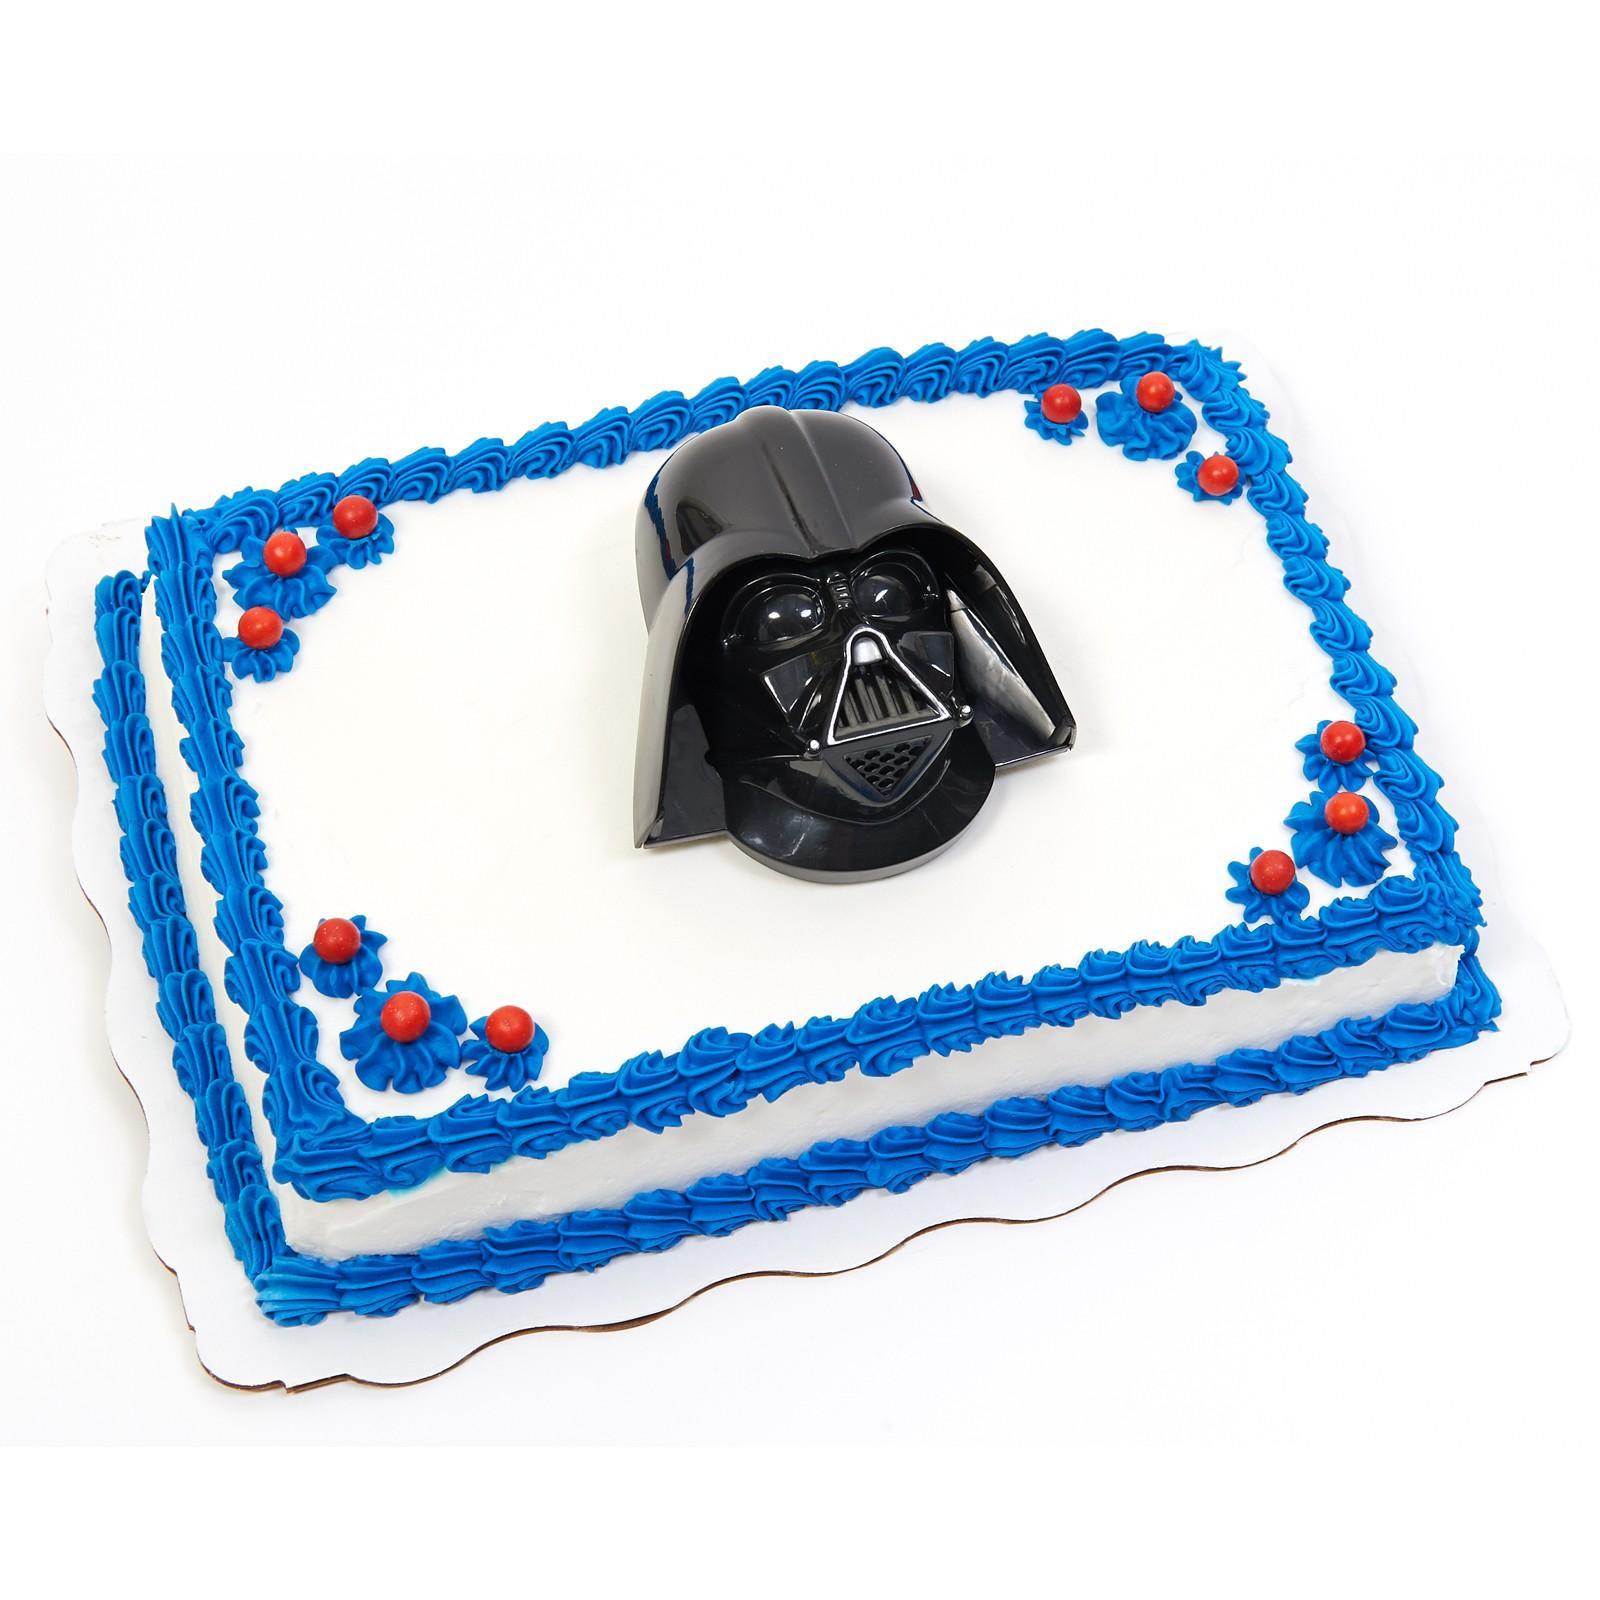 SPECIAL ORDER CAKE DECORATION - STAR WARS-DARTH VADER